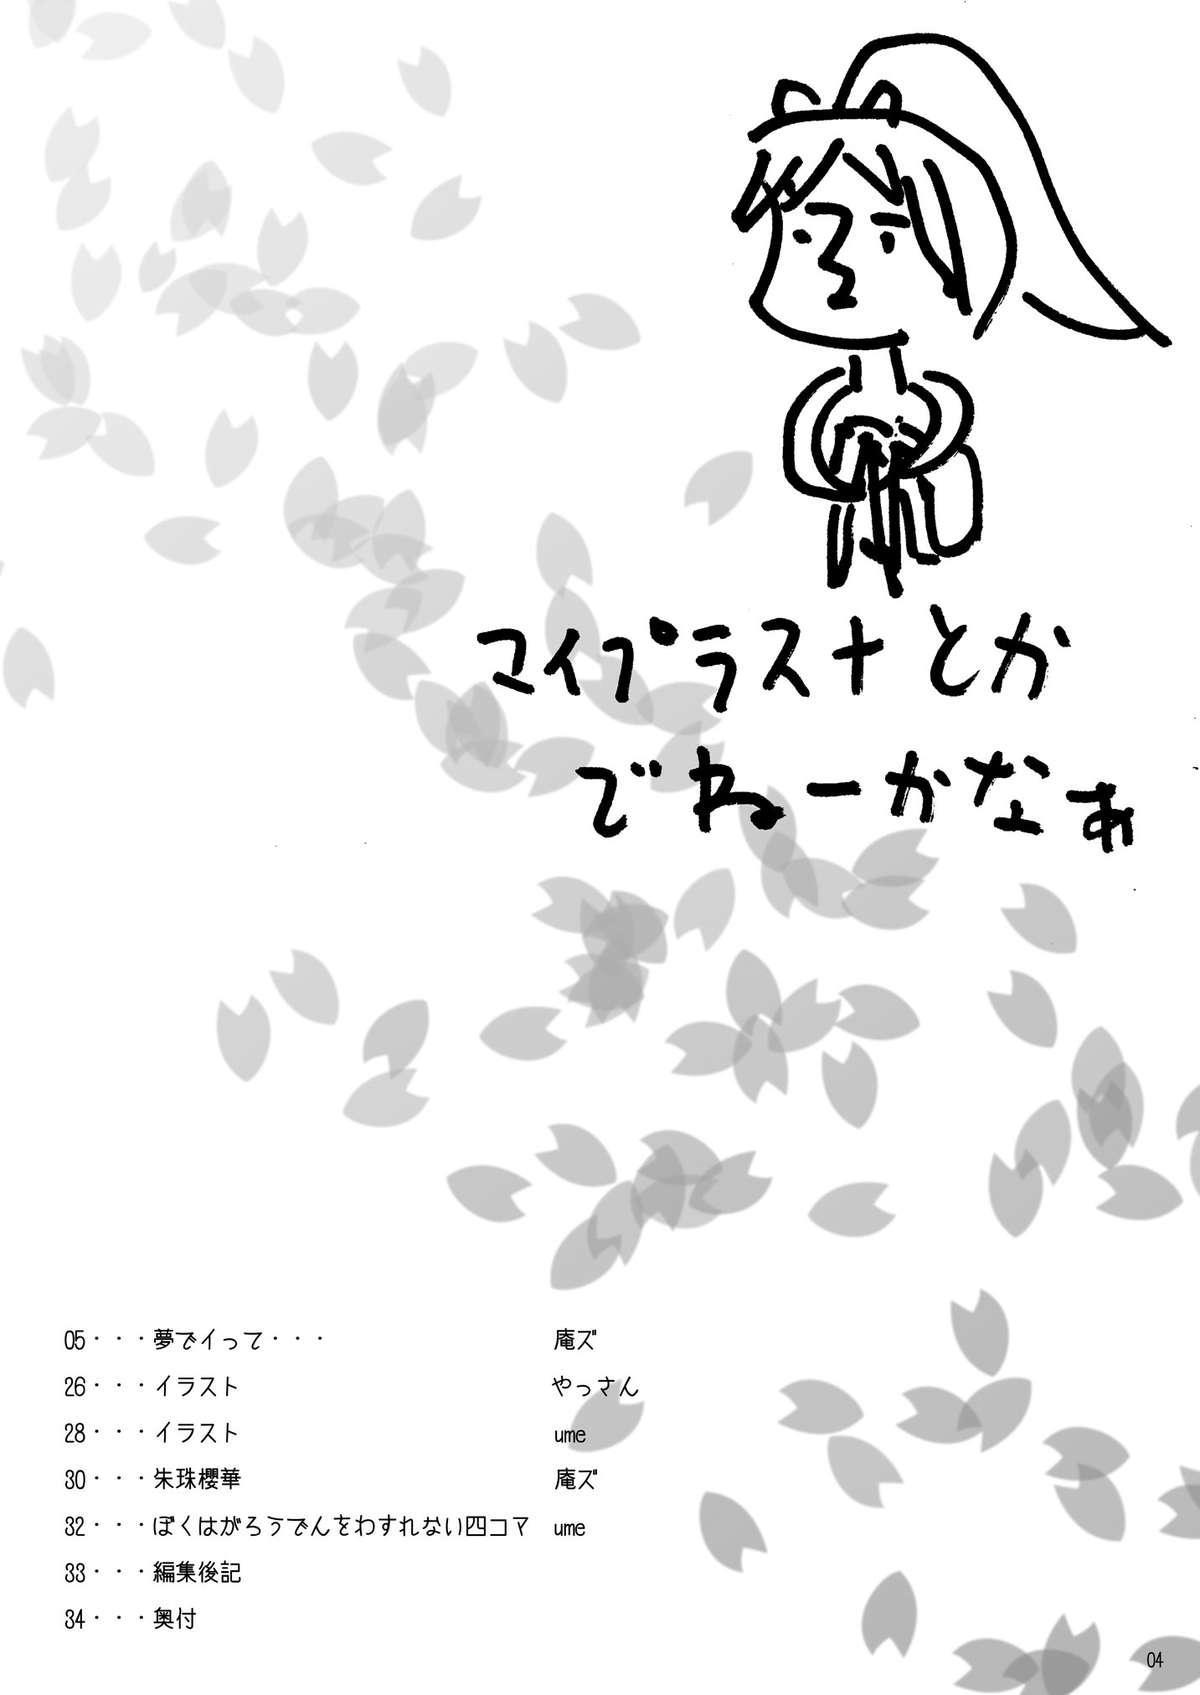 Scarlet Dancing Cherry Blossom 2